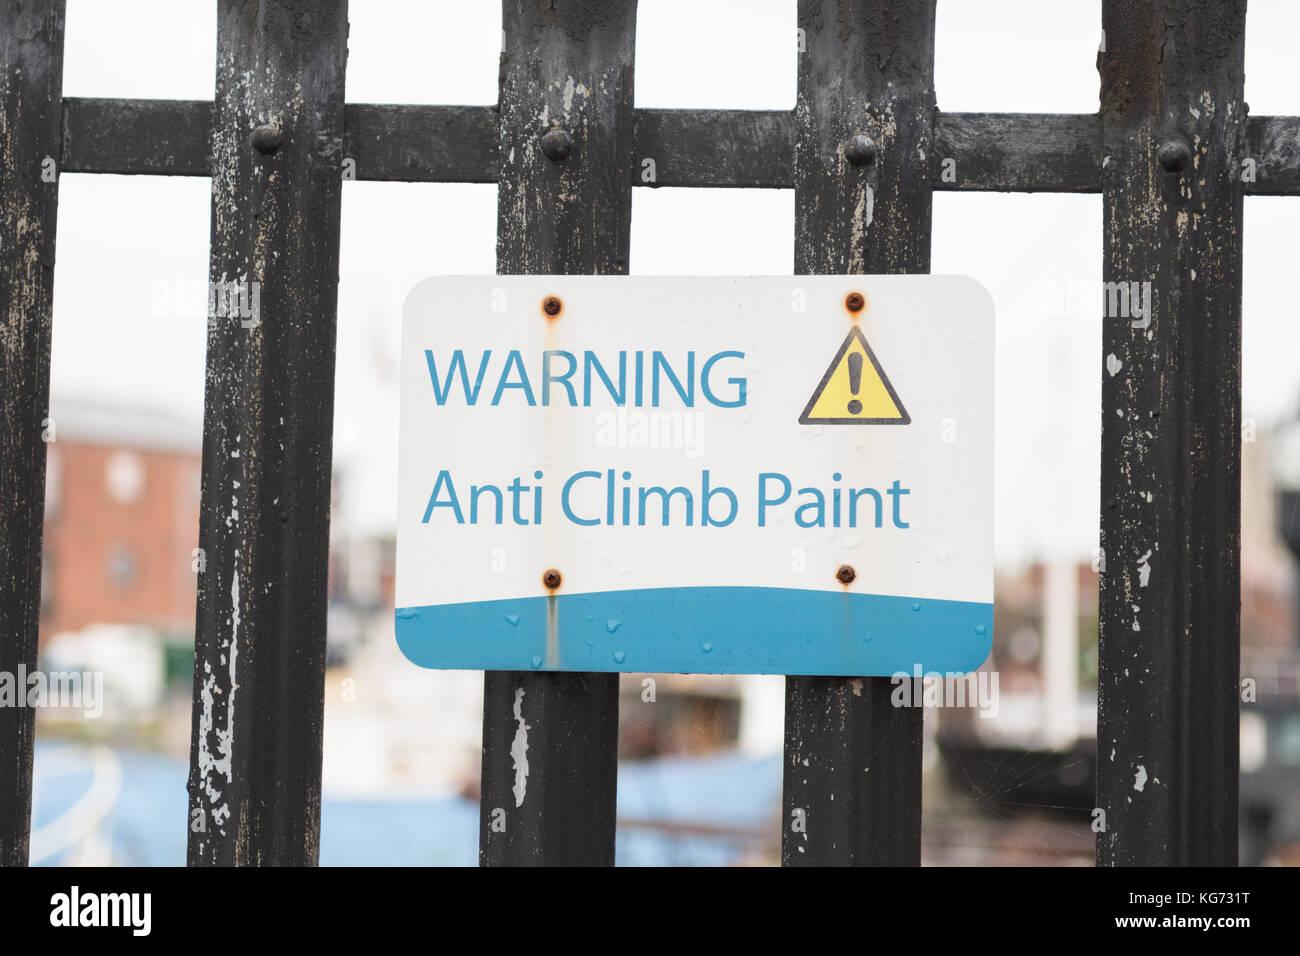 Anti Climb Paint - Stock Image